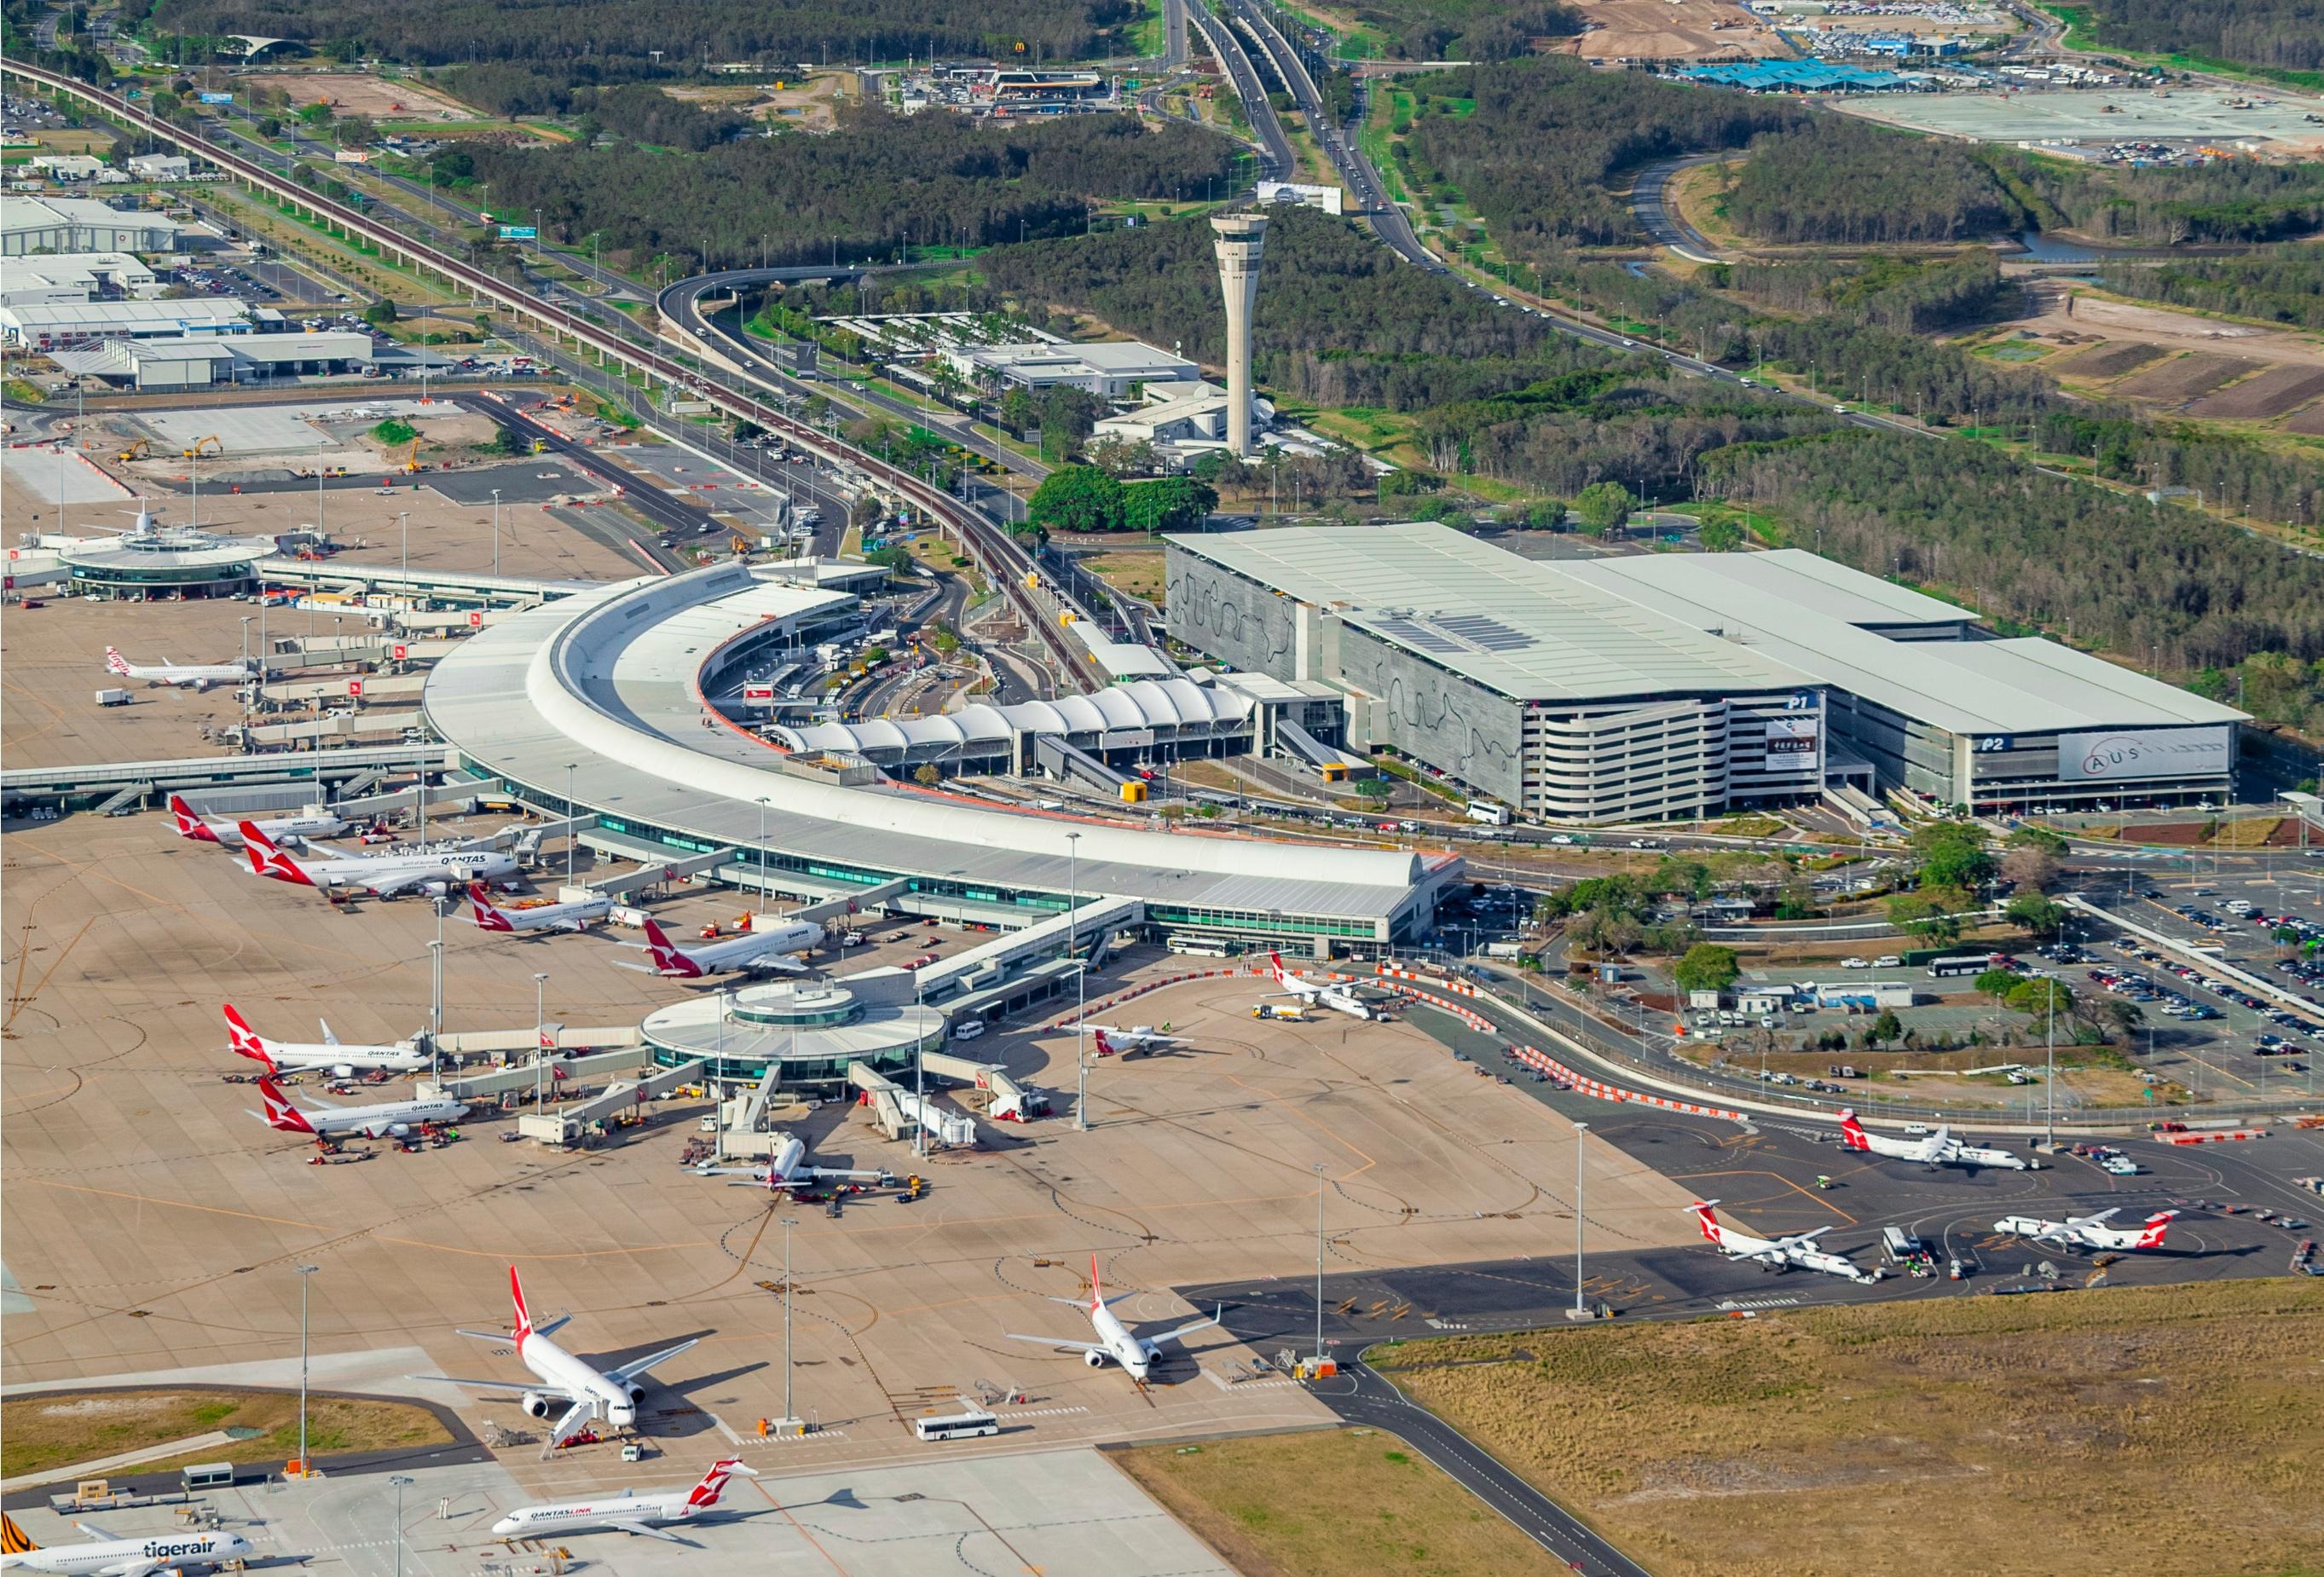 Brisbane Airport completes installation of 1GB broadband network